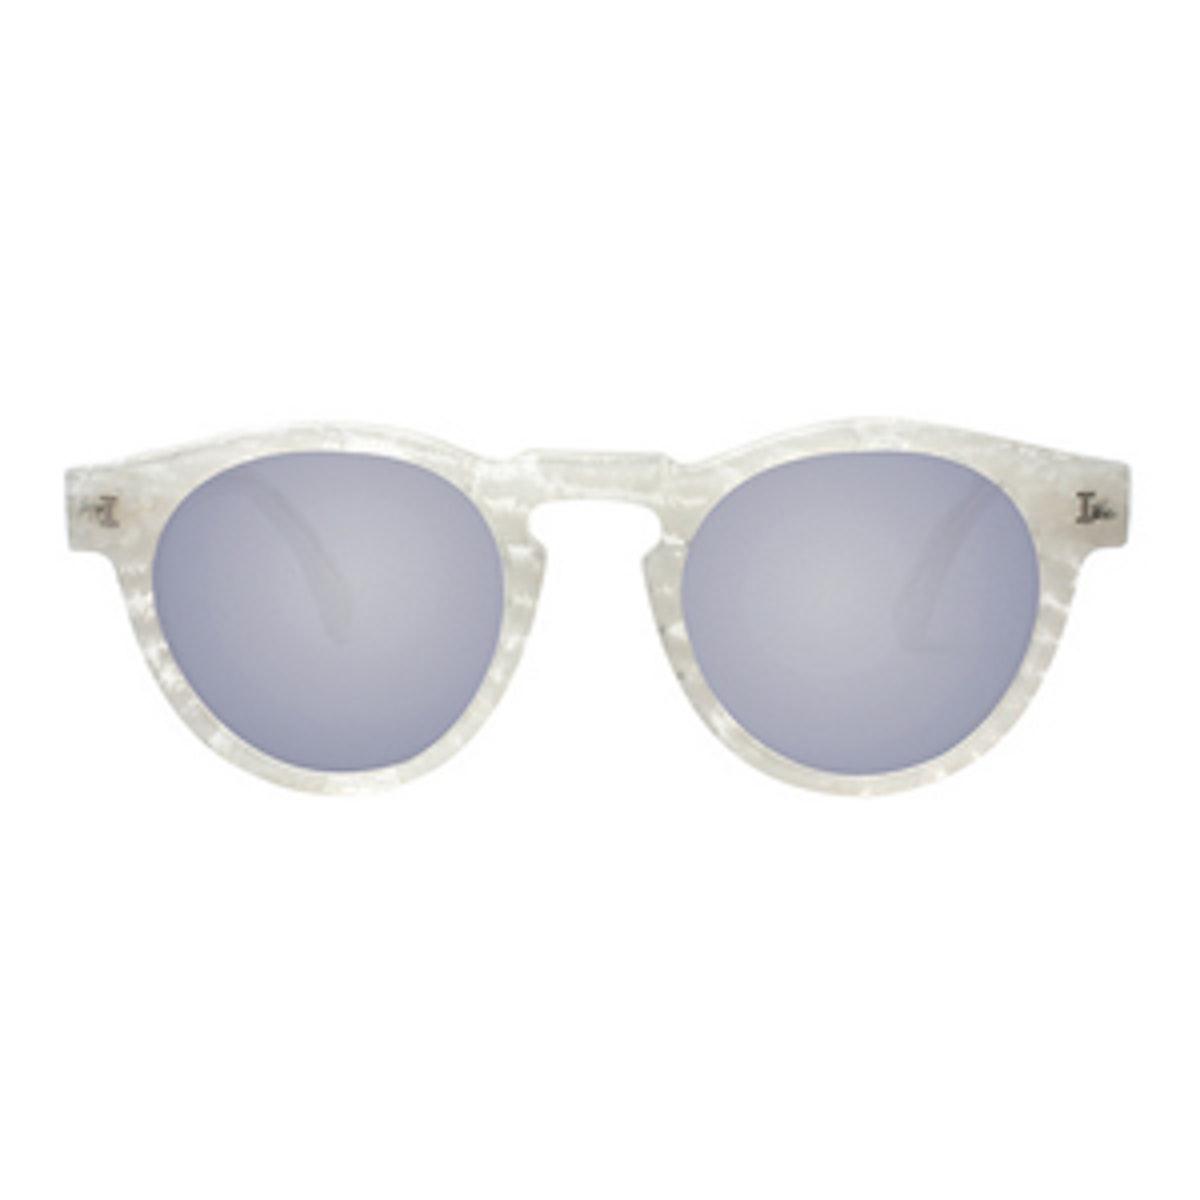 Leonard Frost Sunglasses with Metal